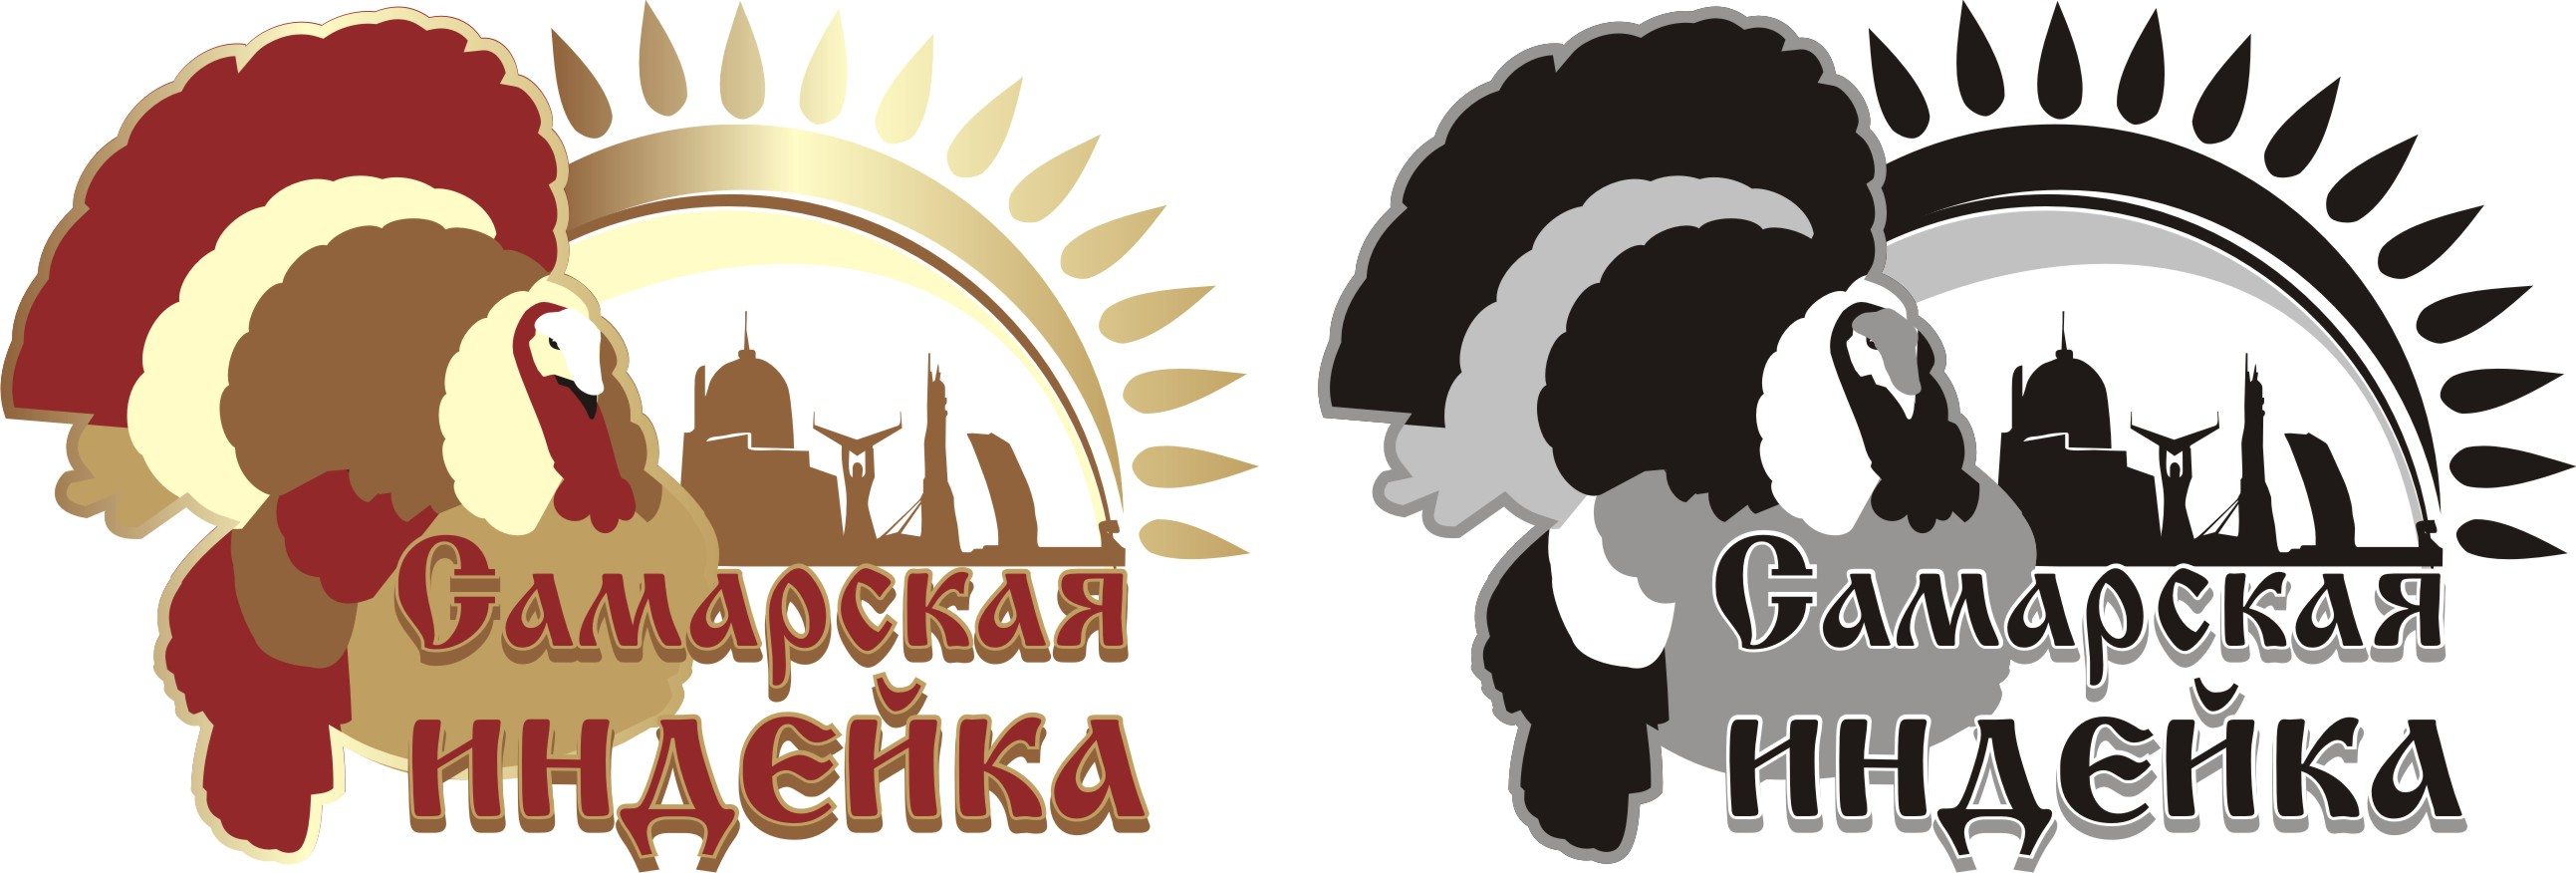 Создание логотипа Сельхоз производителя фото f_63655e81f1815c2d.jpg